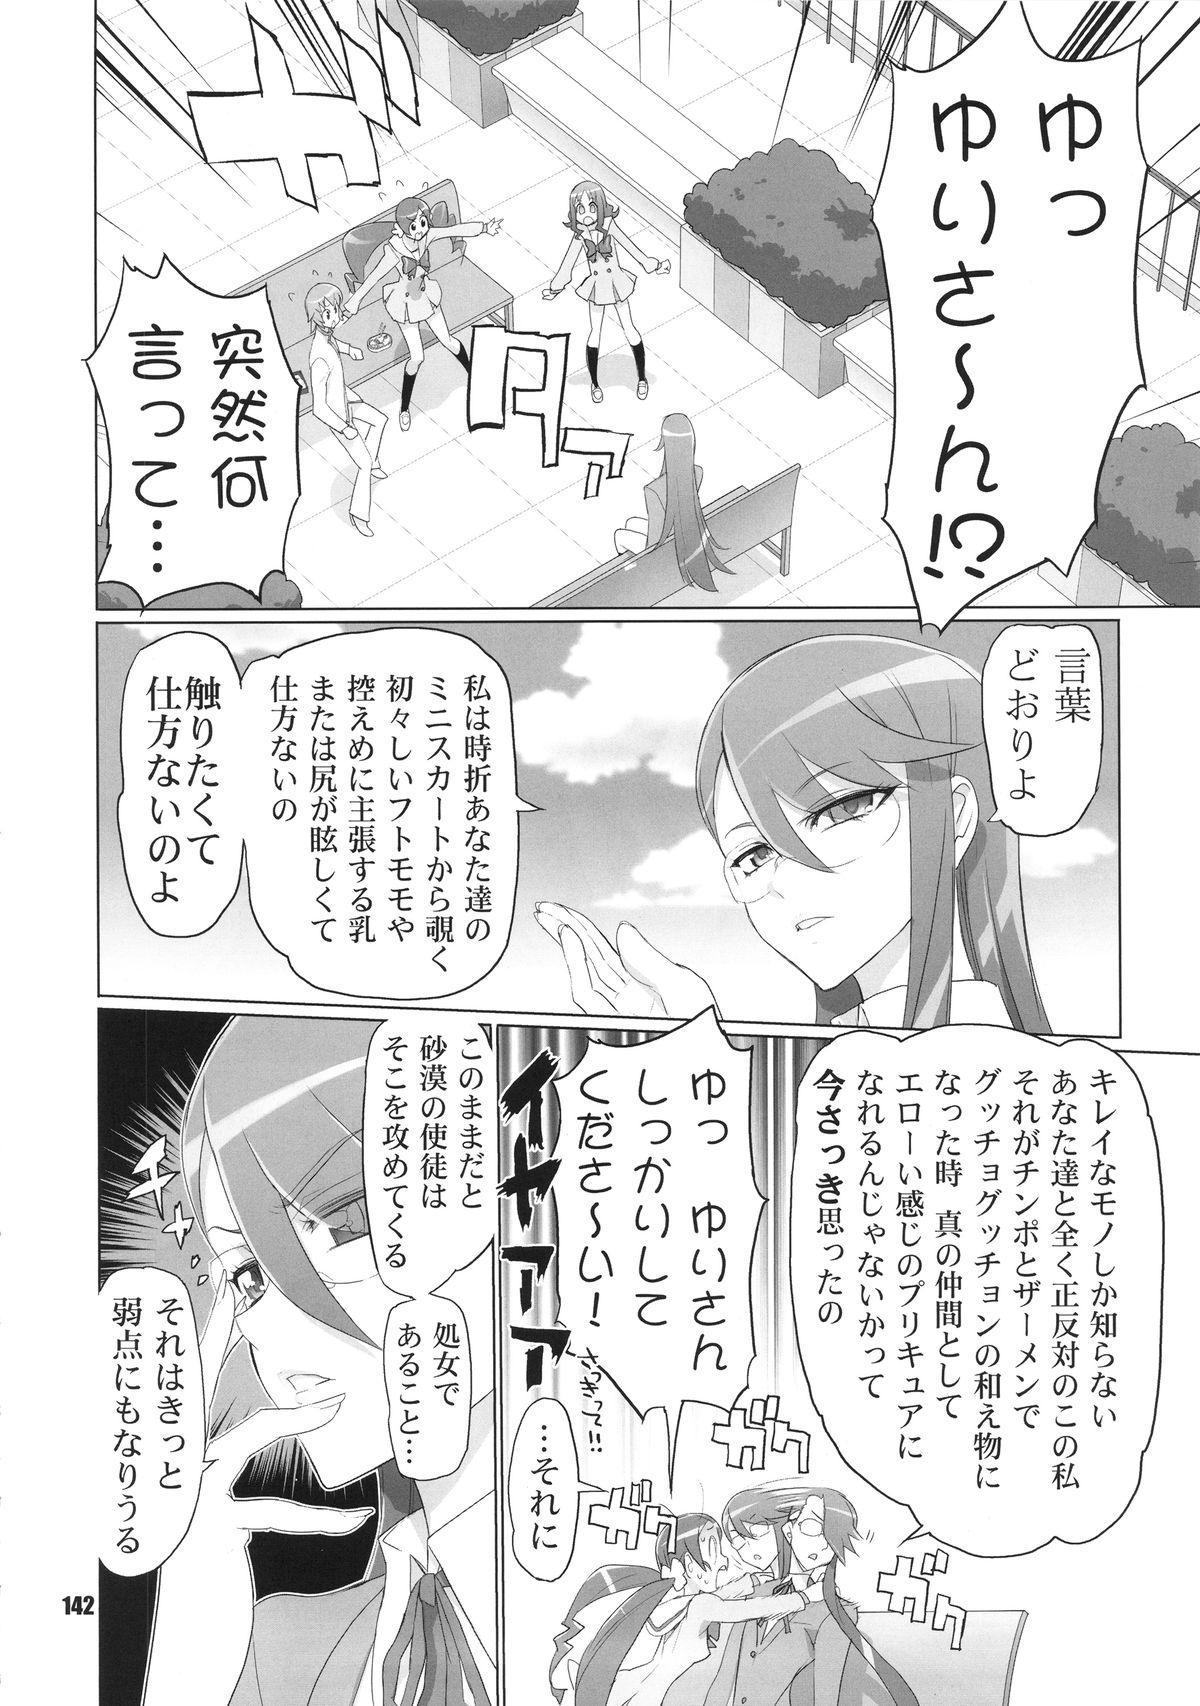 Inazuma Pretty Warrior 140